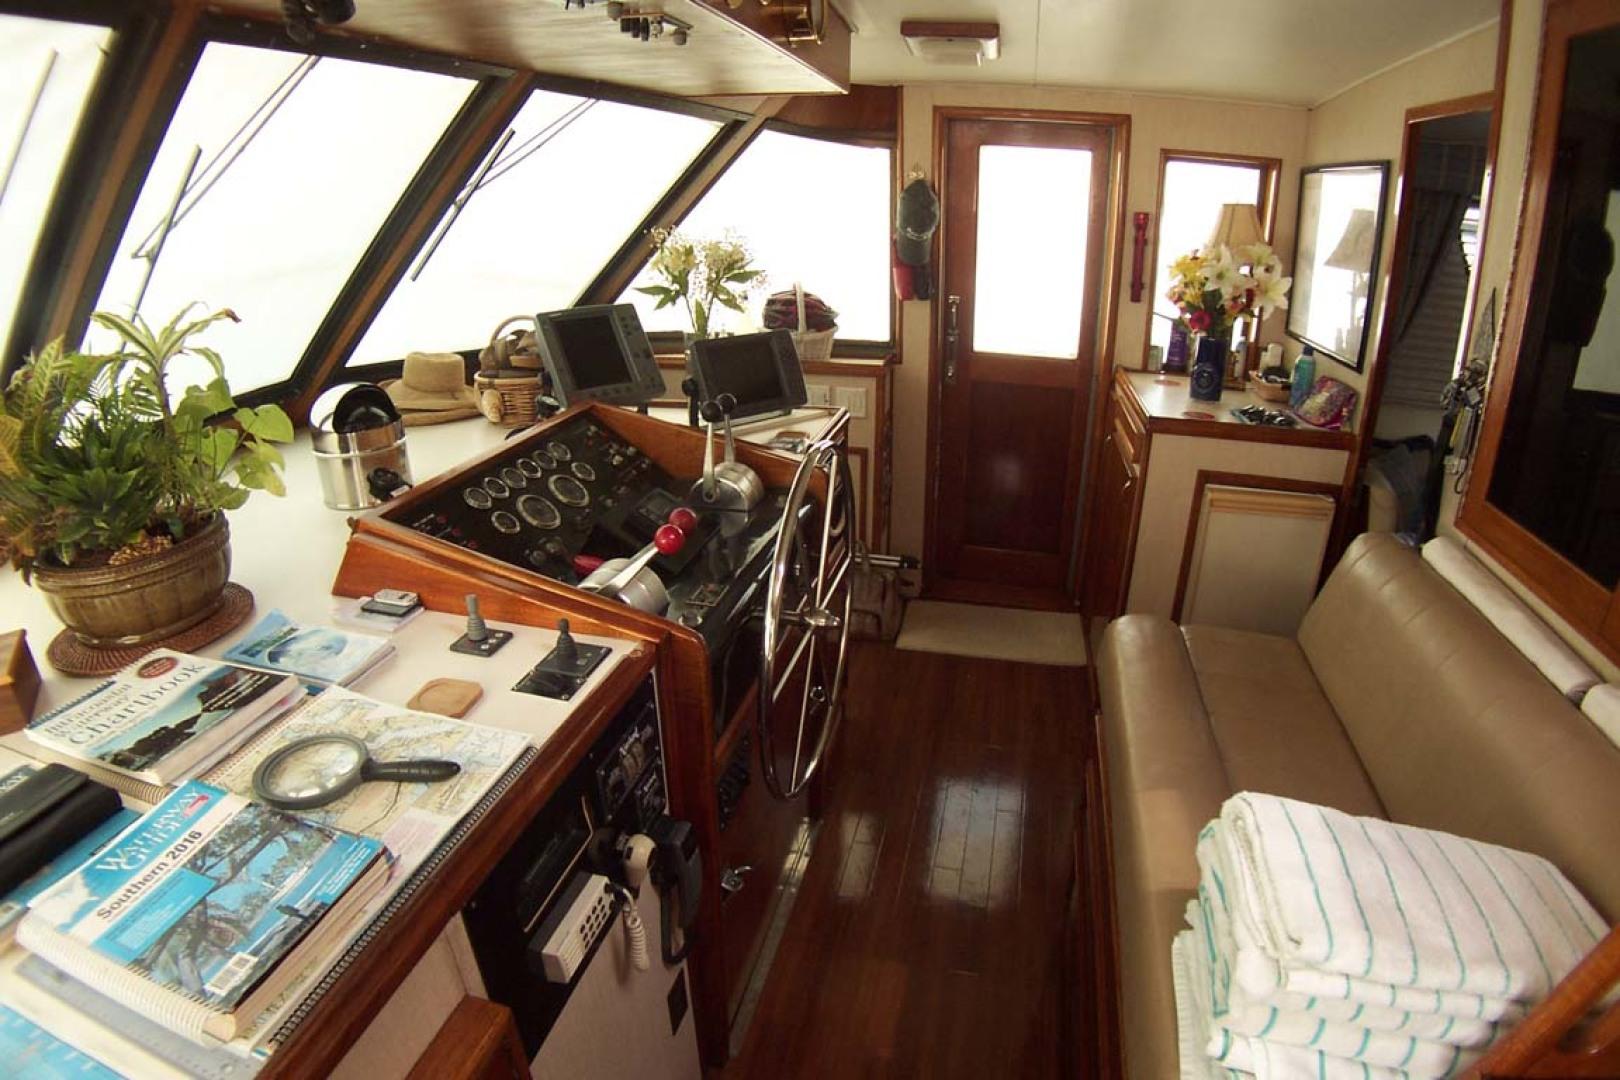 Hatteras-61 Motoryacht 1980-Piece A Cake Ft. Pierce-Florida-United States-Wheelhouse to Stbd-1094505 | Thumbnail